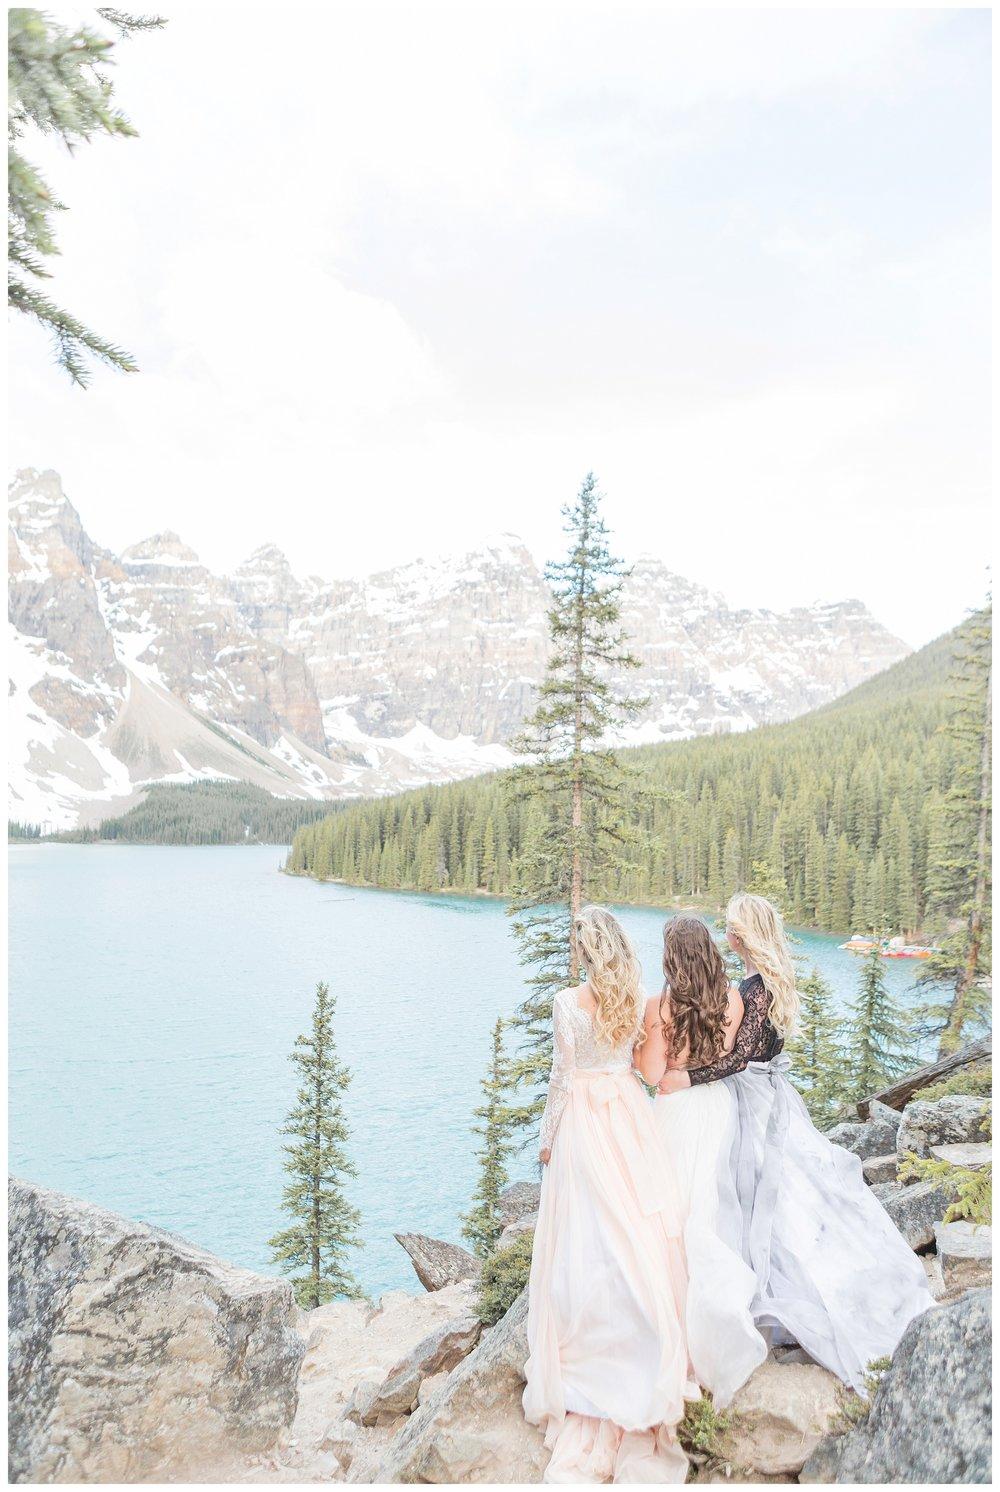 Banff_0013.jpg